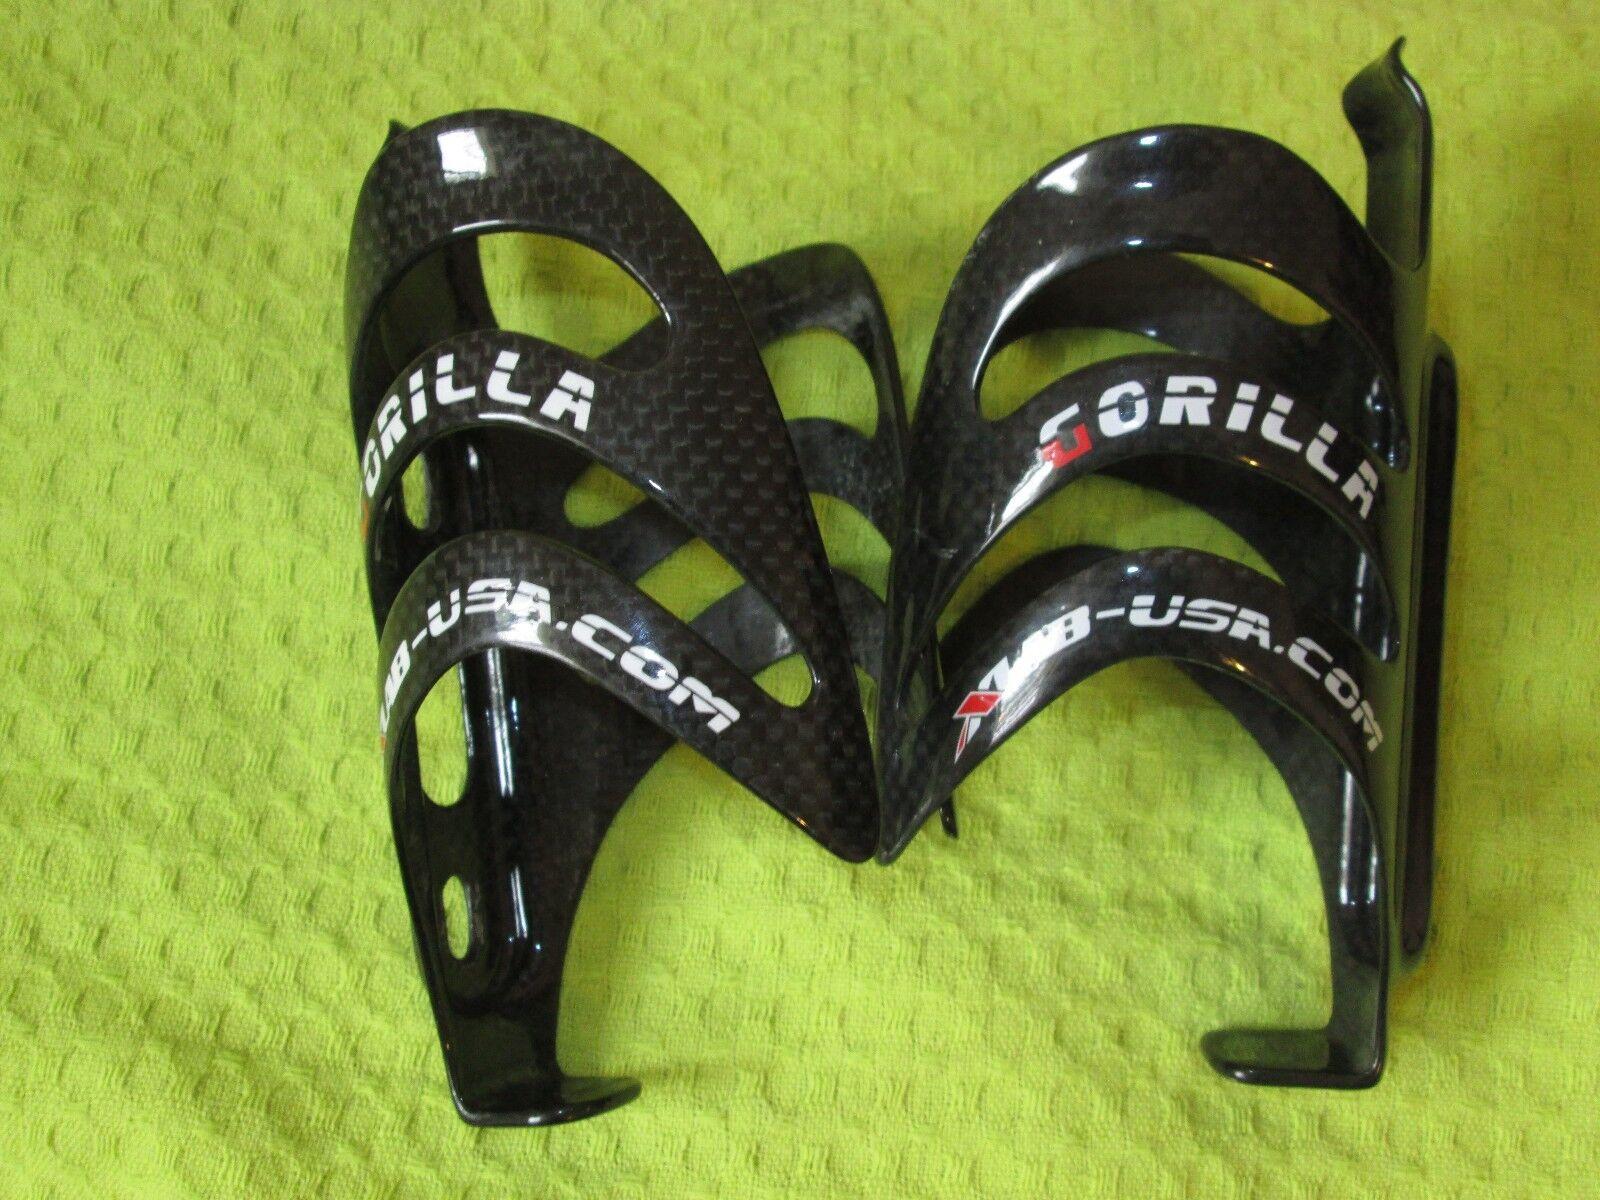 Qty 2 XLAB Two Gorilla Gloss autobon Water Bottle Cages strada CX Triathlon ciclismo